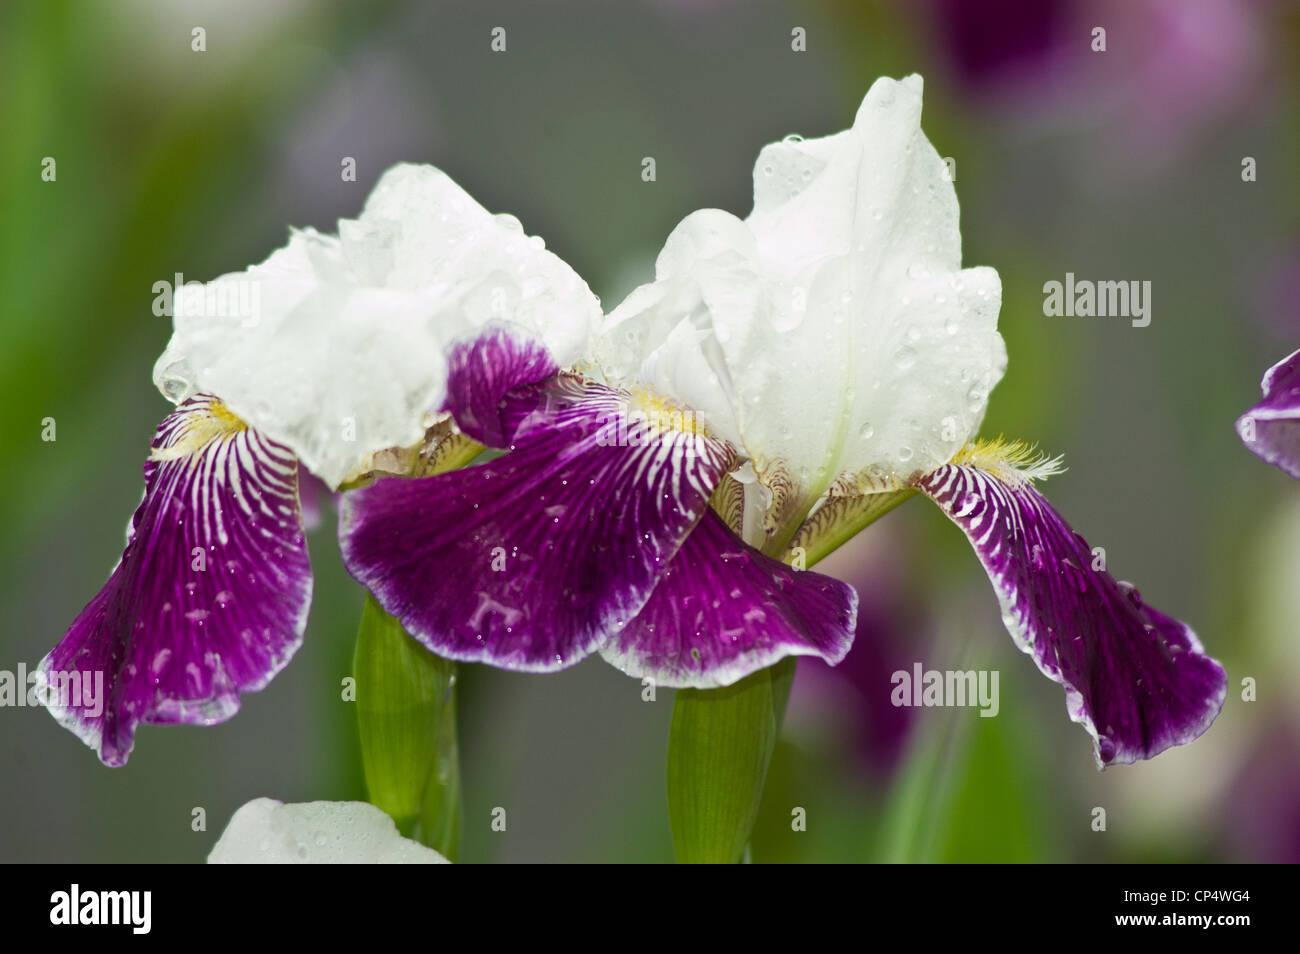 Two Deep Purple Violet White Iris Flower Close Up Stock Photo